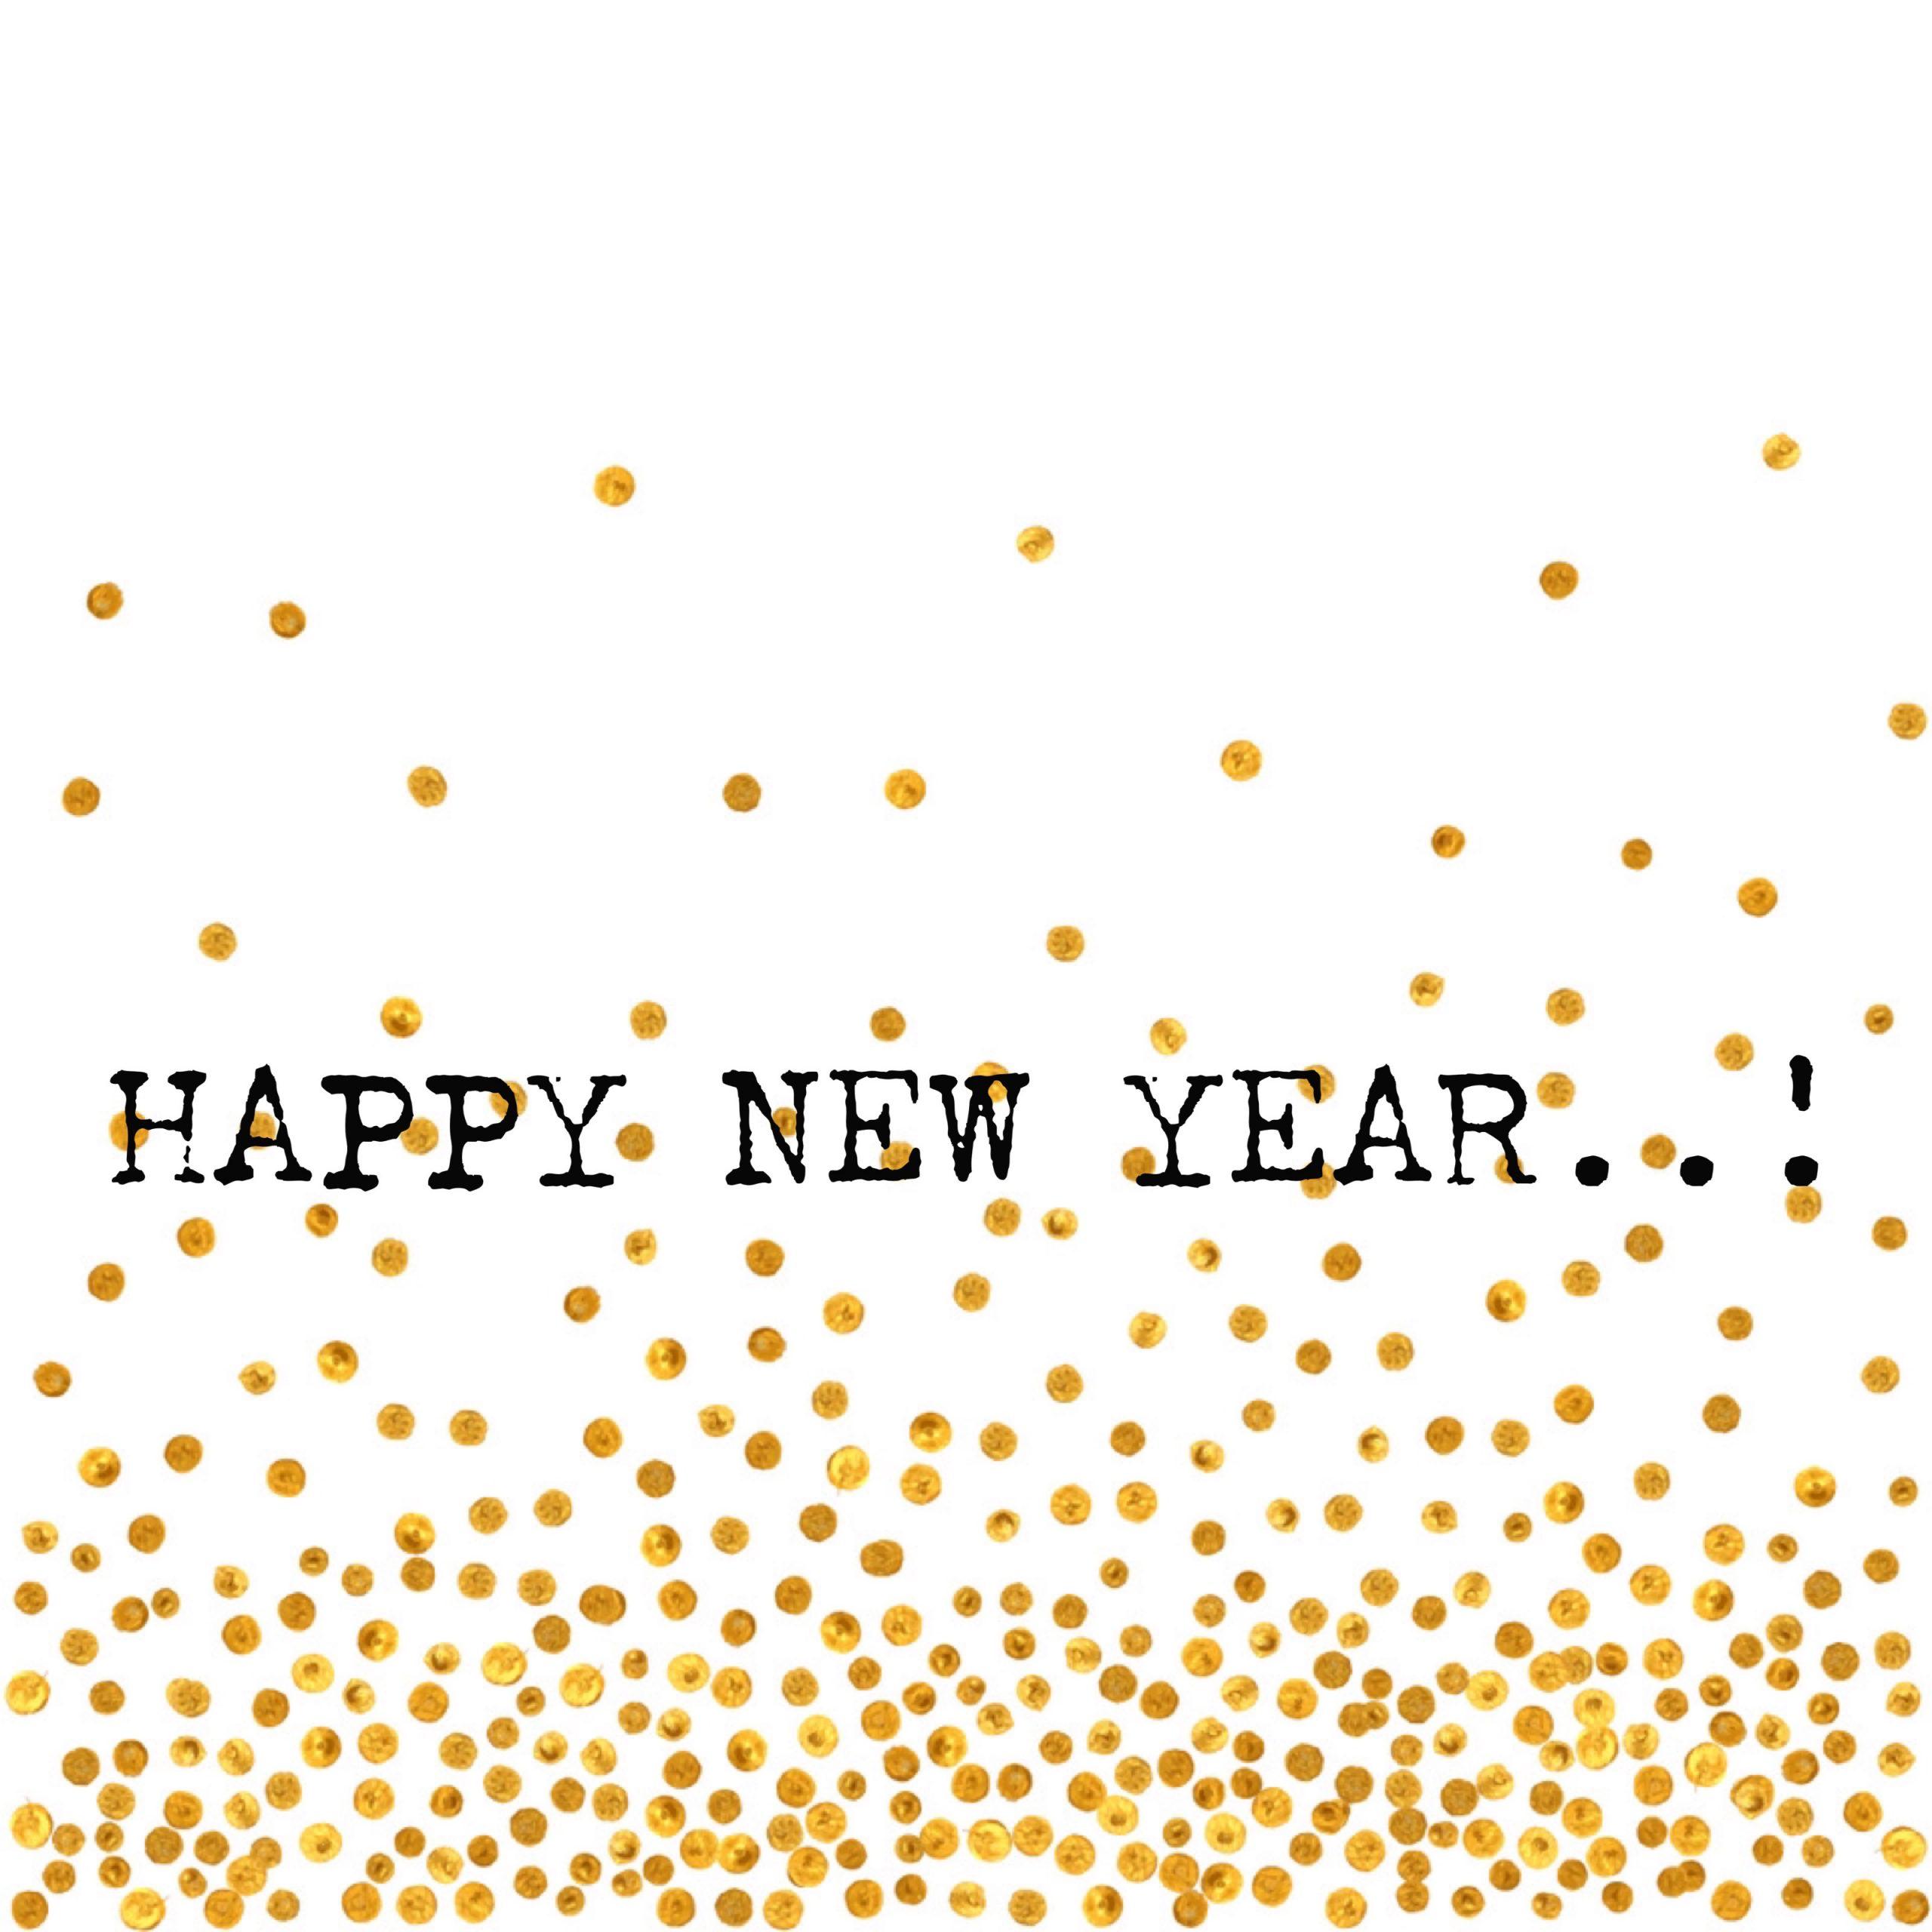 HAPPY NEW YEAR..!